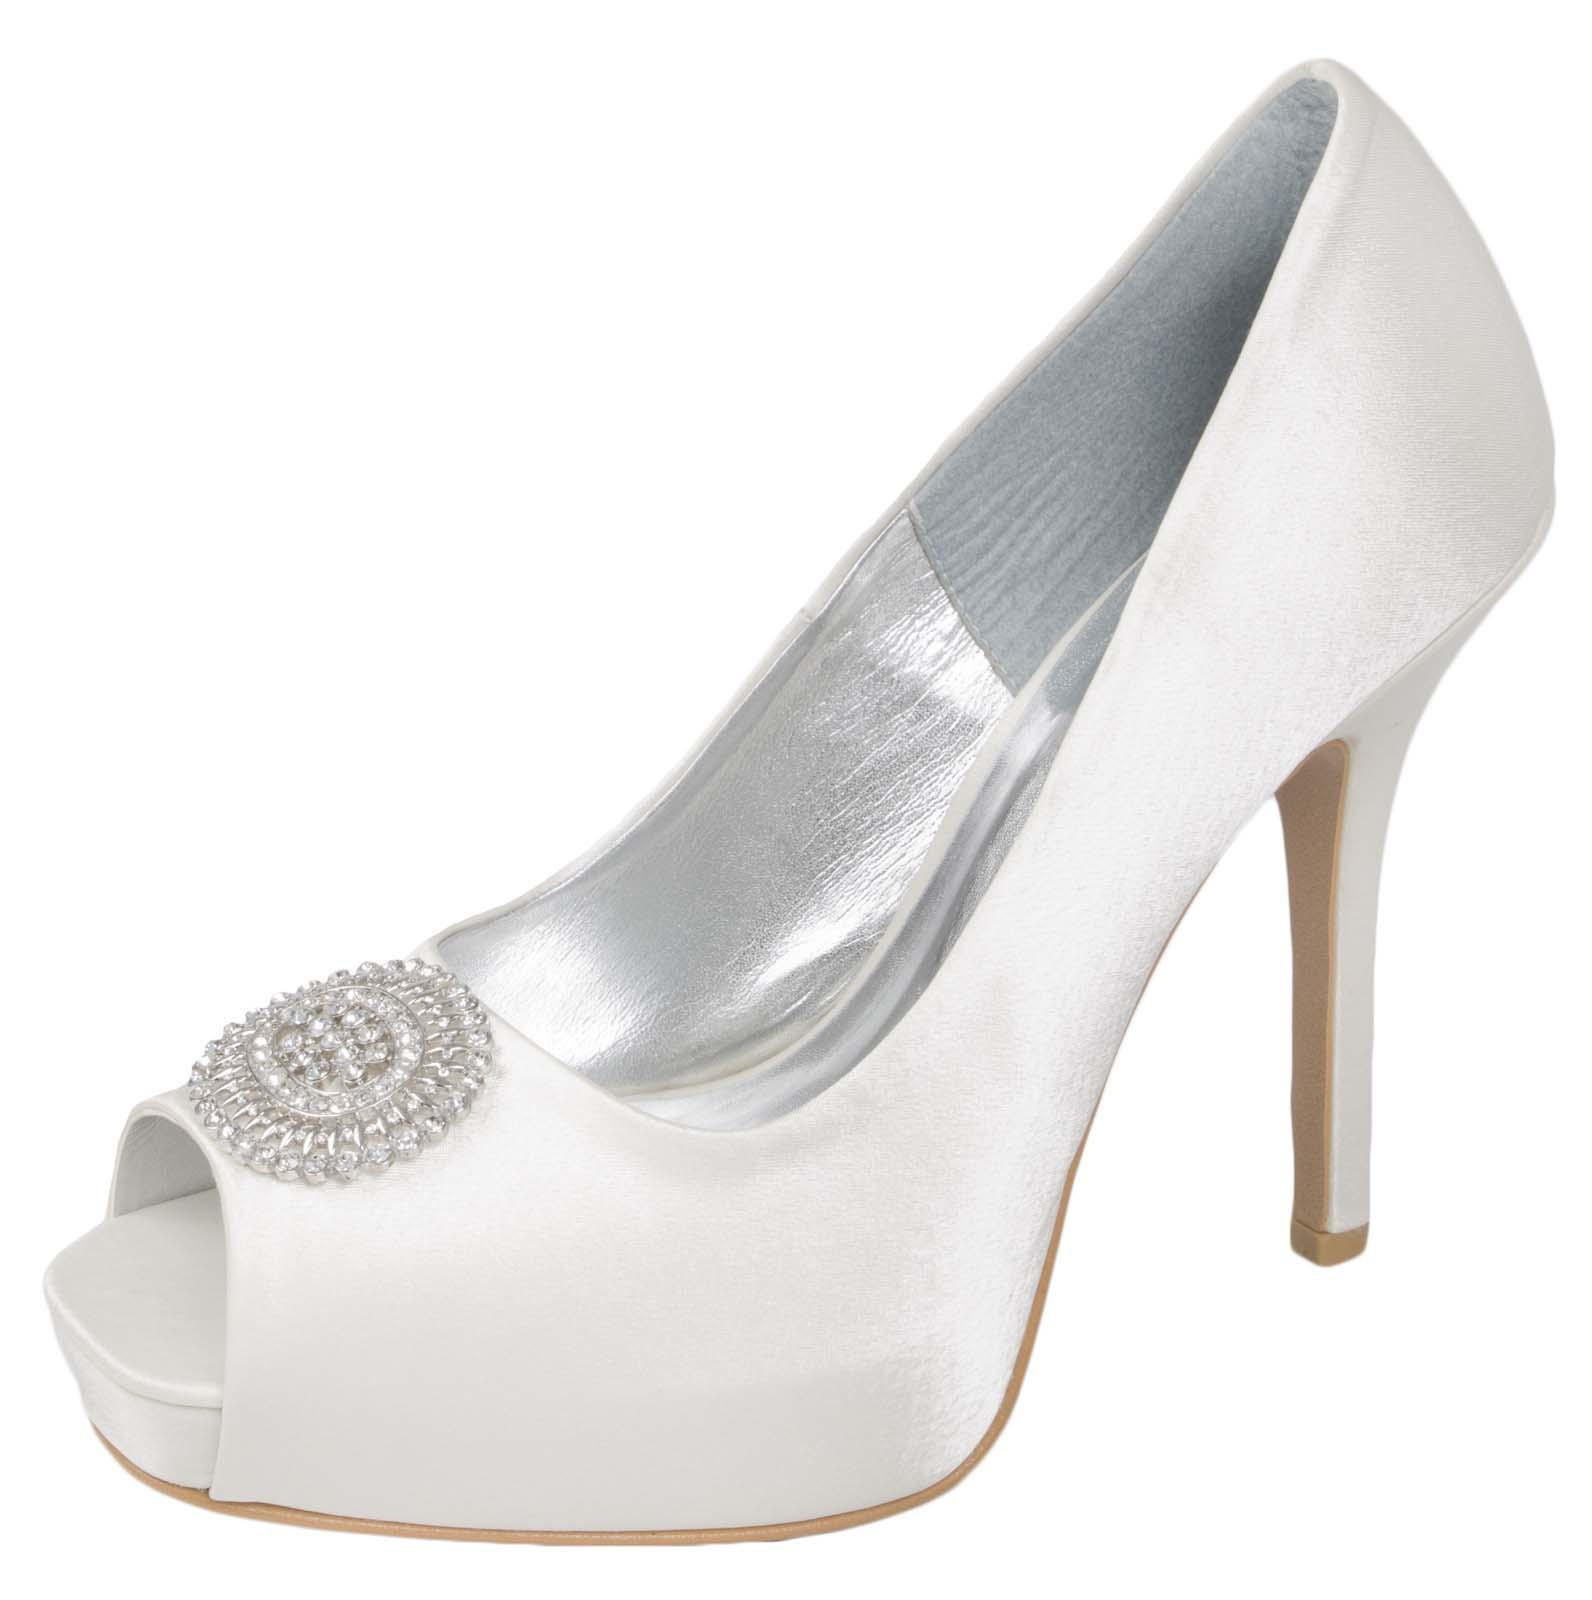 Ladies Diamante Bridal Wedding Shoes Satin Platform High